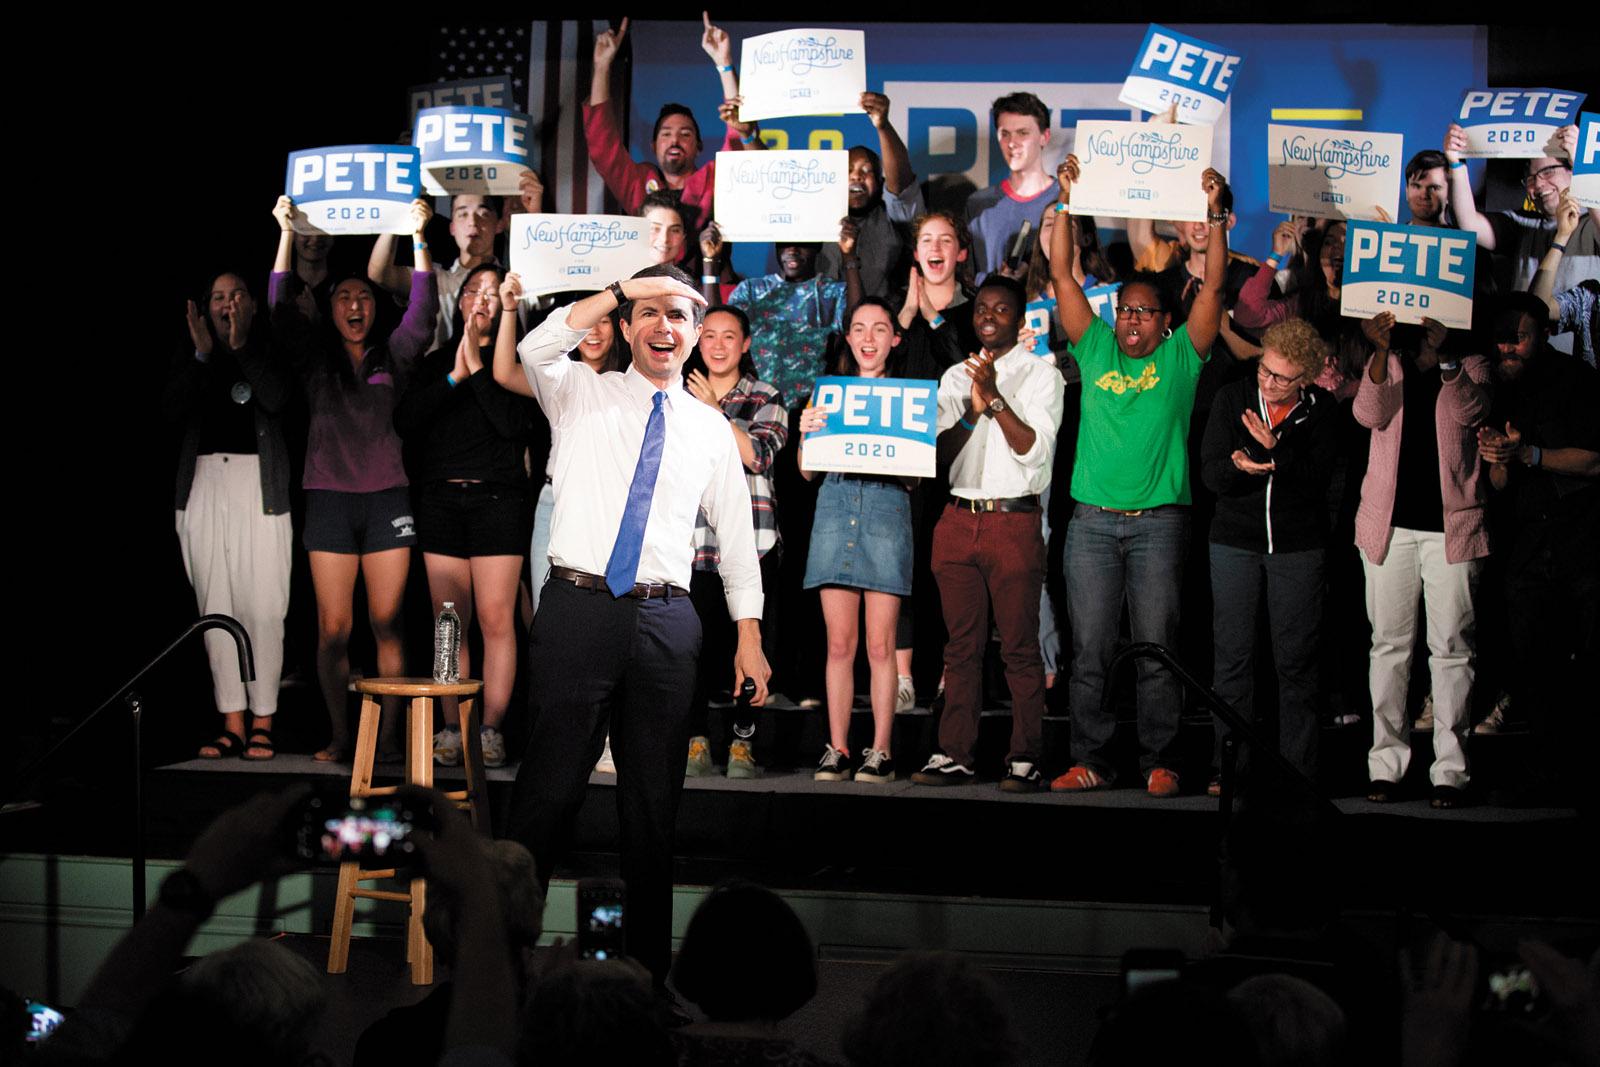 Pete Buttigieg at a presidential campaign event, 2019